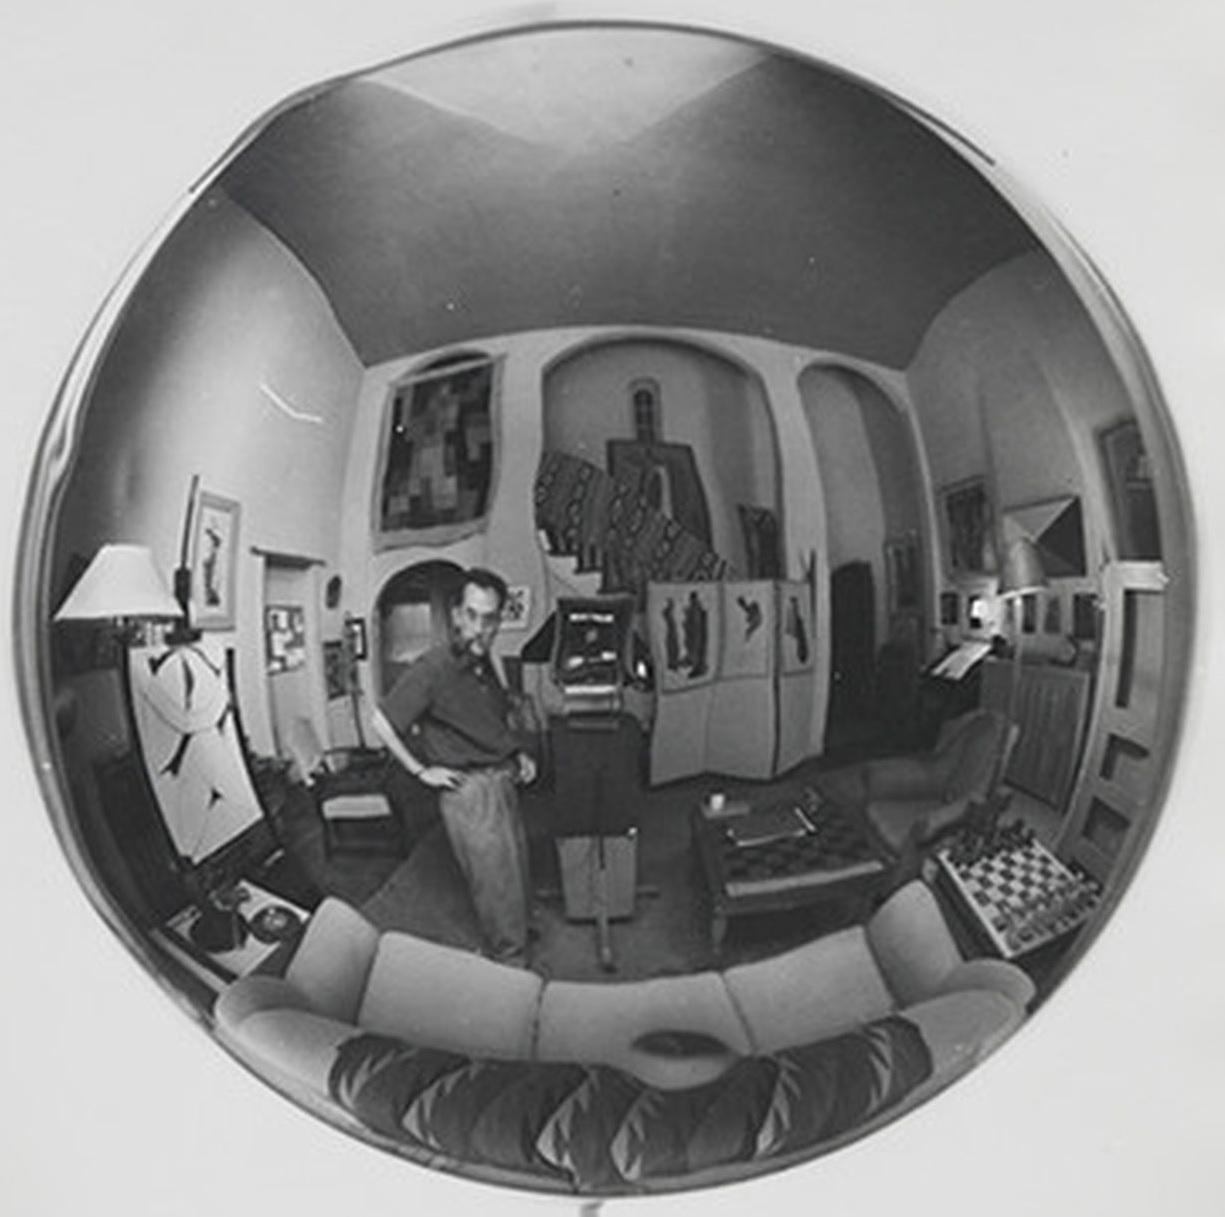 Man Ray Autoportrait, Vine Street, Vers 1948 b